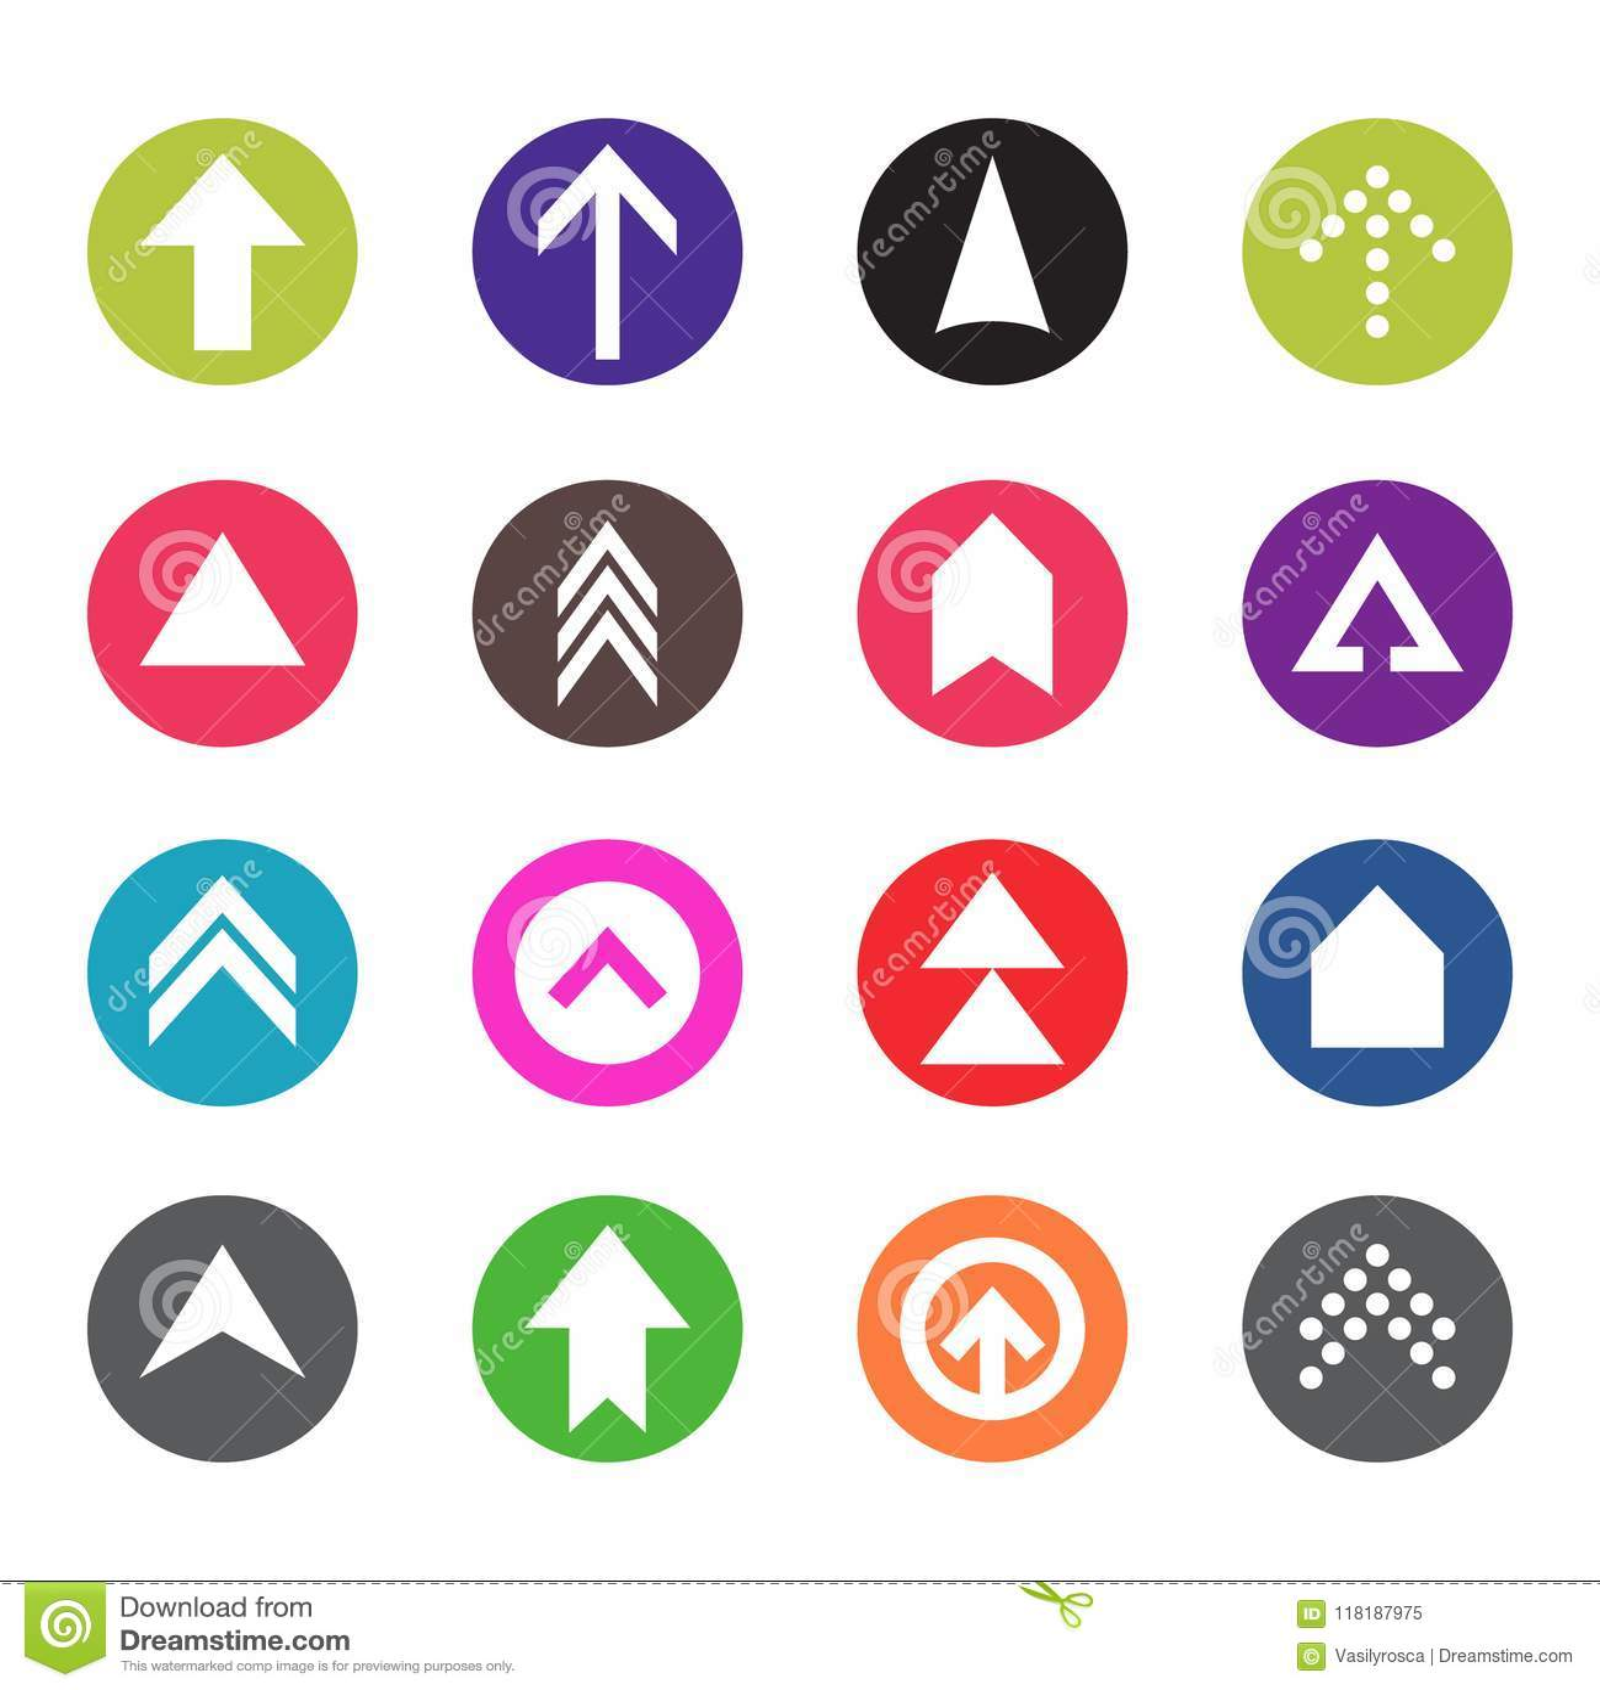 Arrow Icon Set Web Arrow Pictogram Design Internet Elements